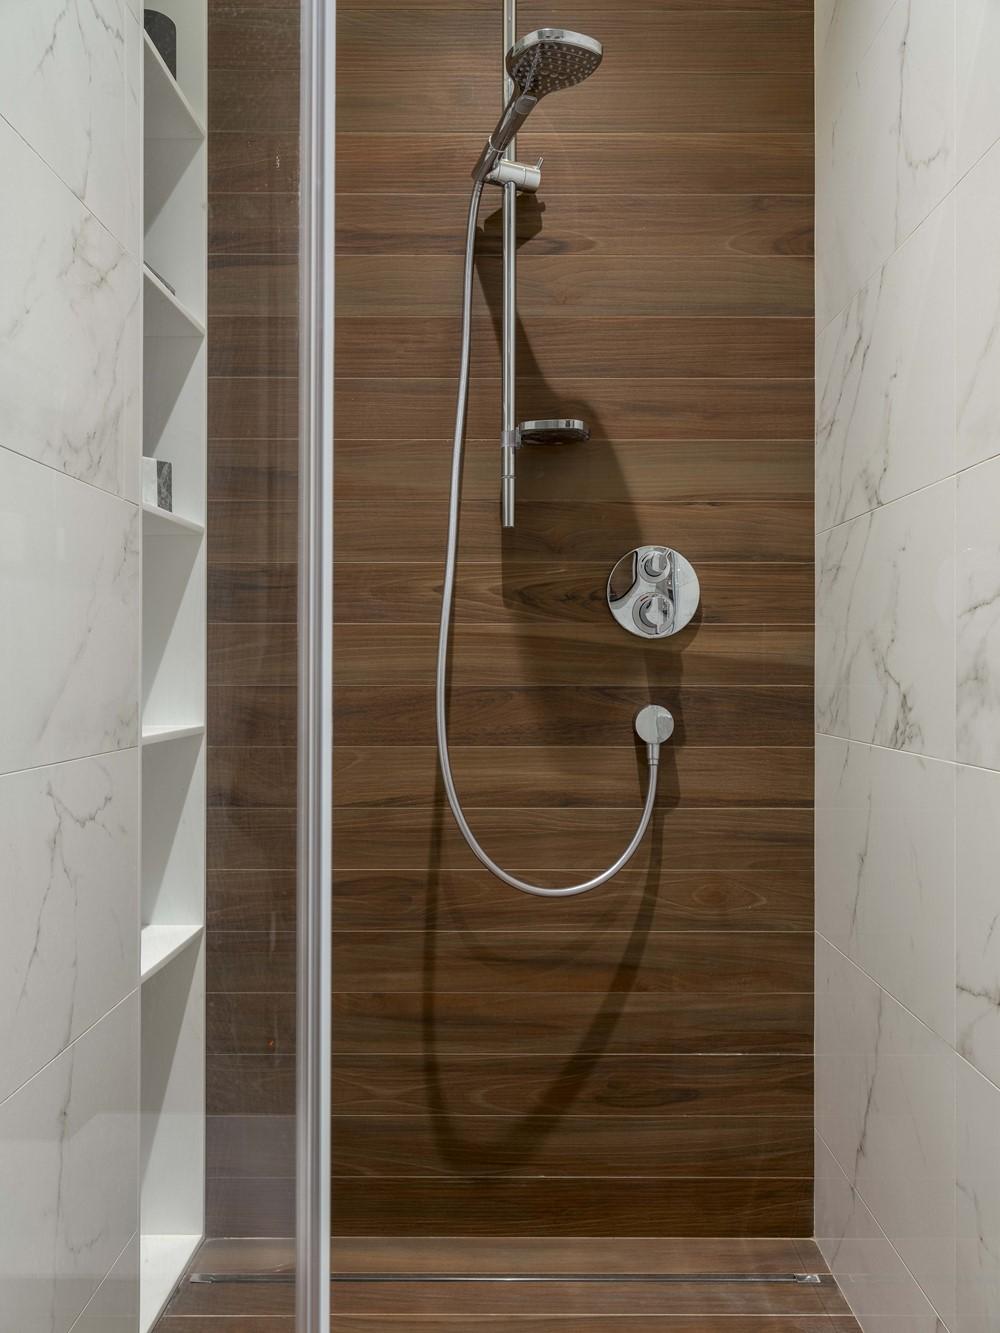 aqua design by geometrium myhouseidea. Black Bedroom Furniture Sets. Home Design Ideas